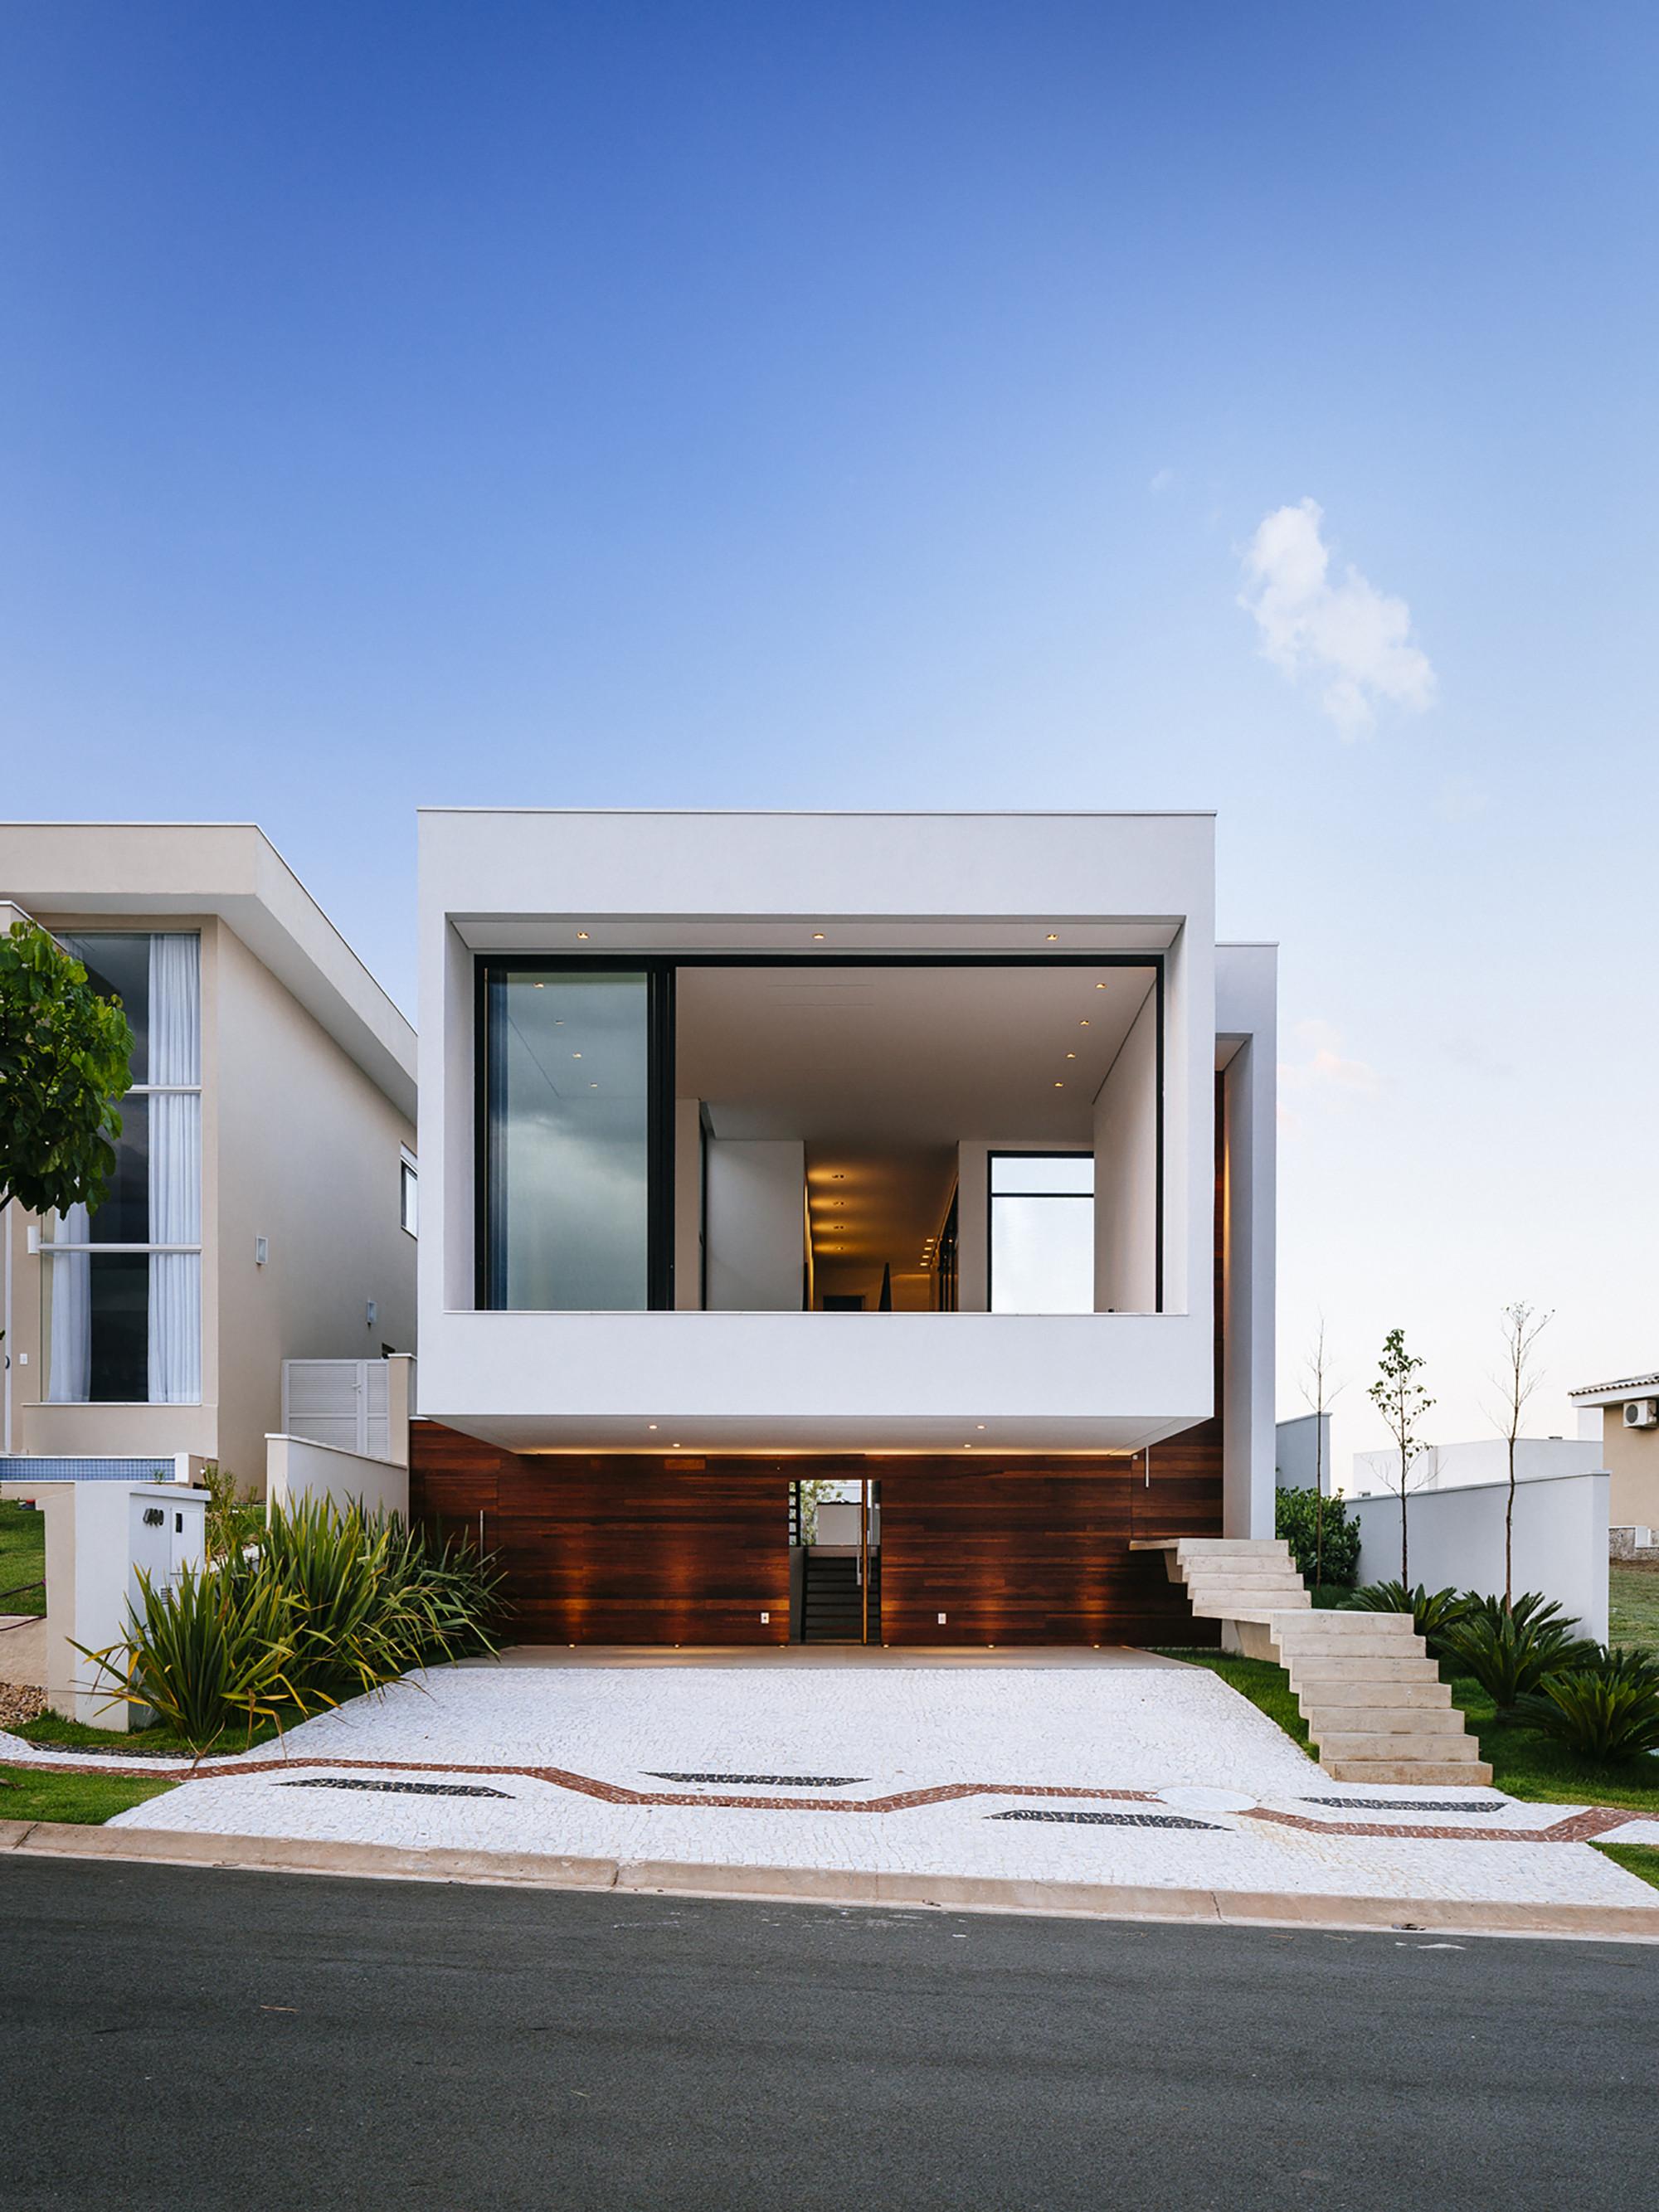 Casa guaiume 24 7 arquitetura design archdaily brasil for Casa design monterotondo